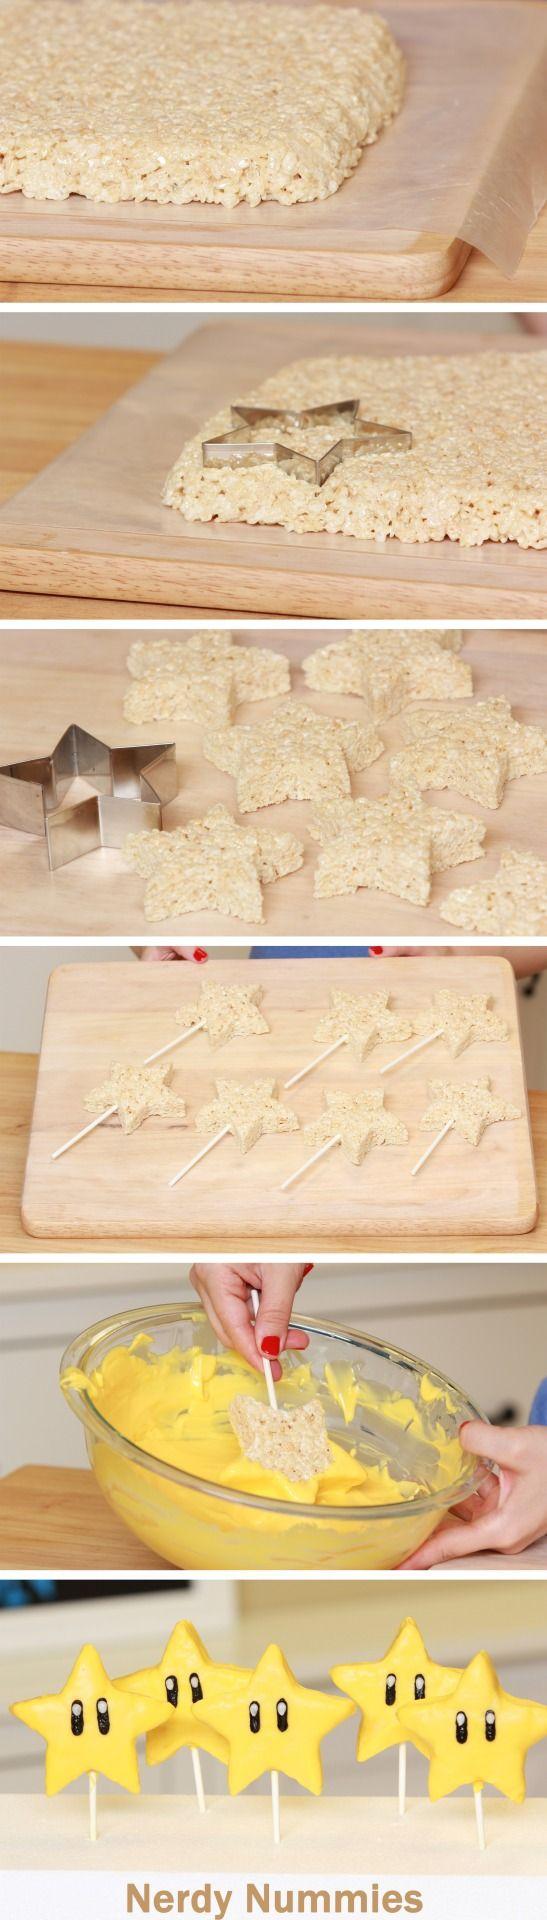 Rosanna Pansino — How to make Mario Star Rice Krispy Pops!